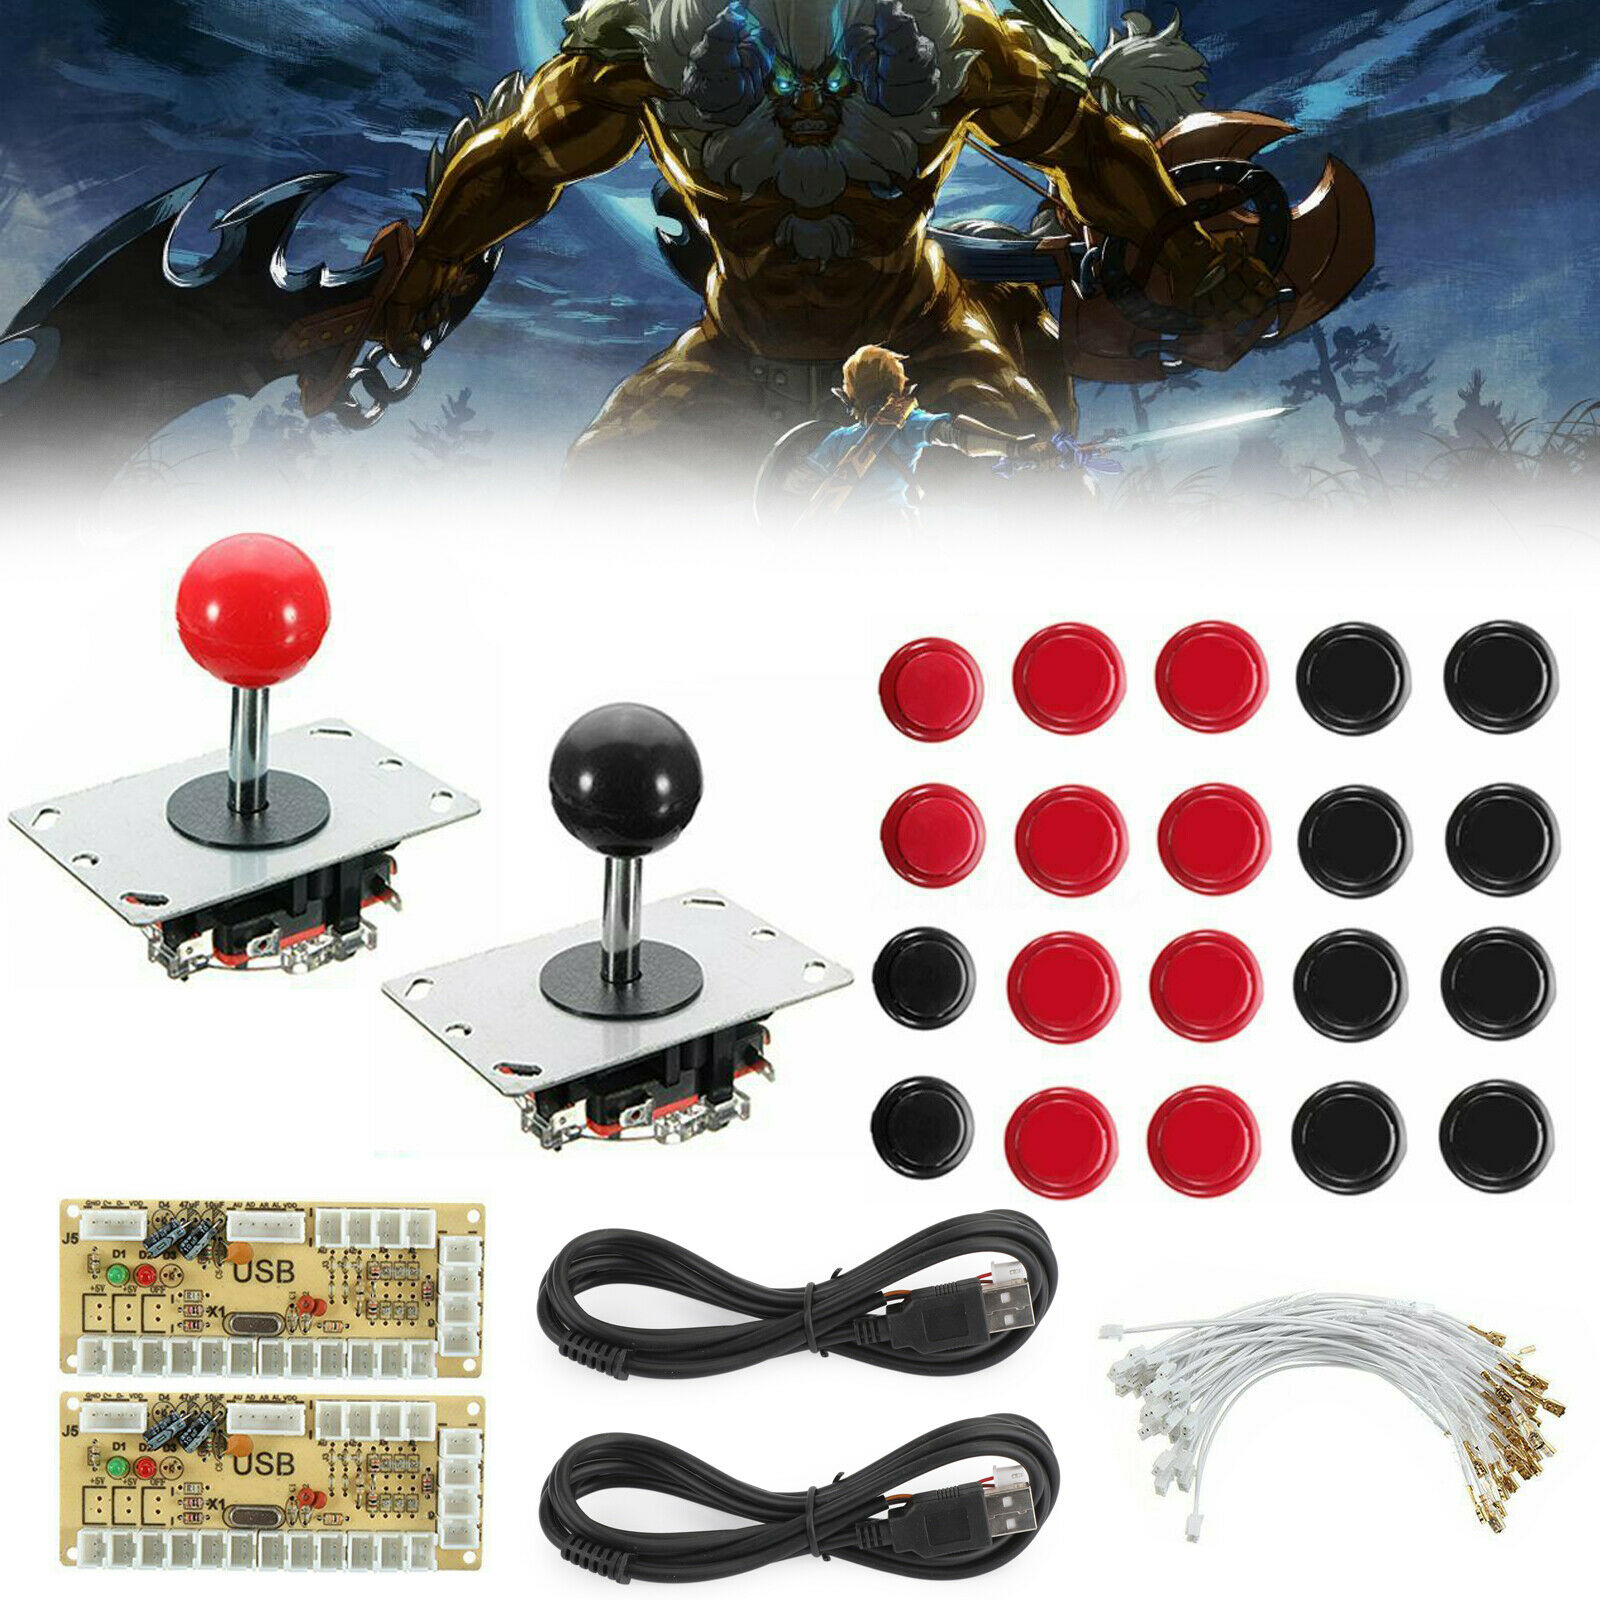 DIY Joystick Arcade Game USB Encoder+Joystick+ Buttons+Cables B2